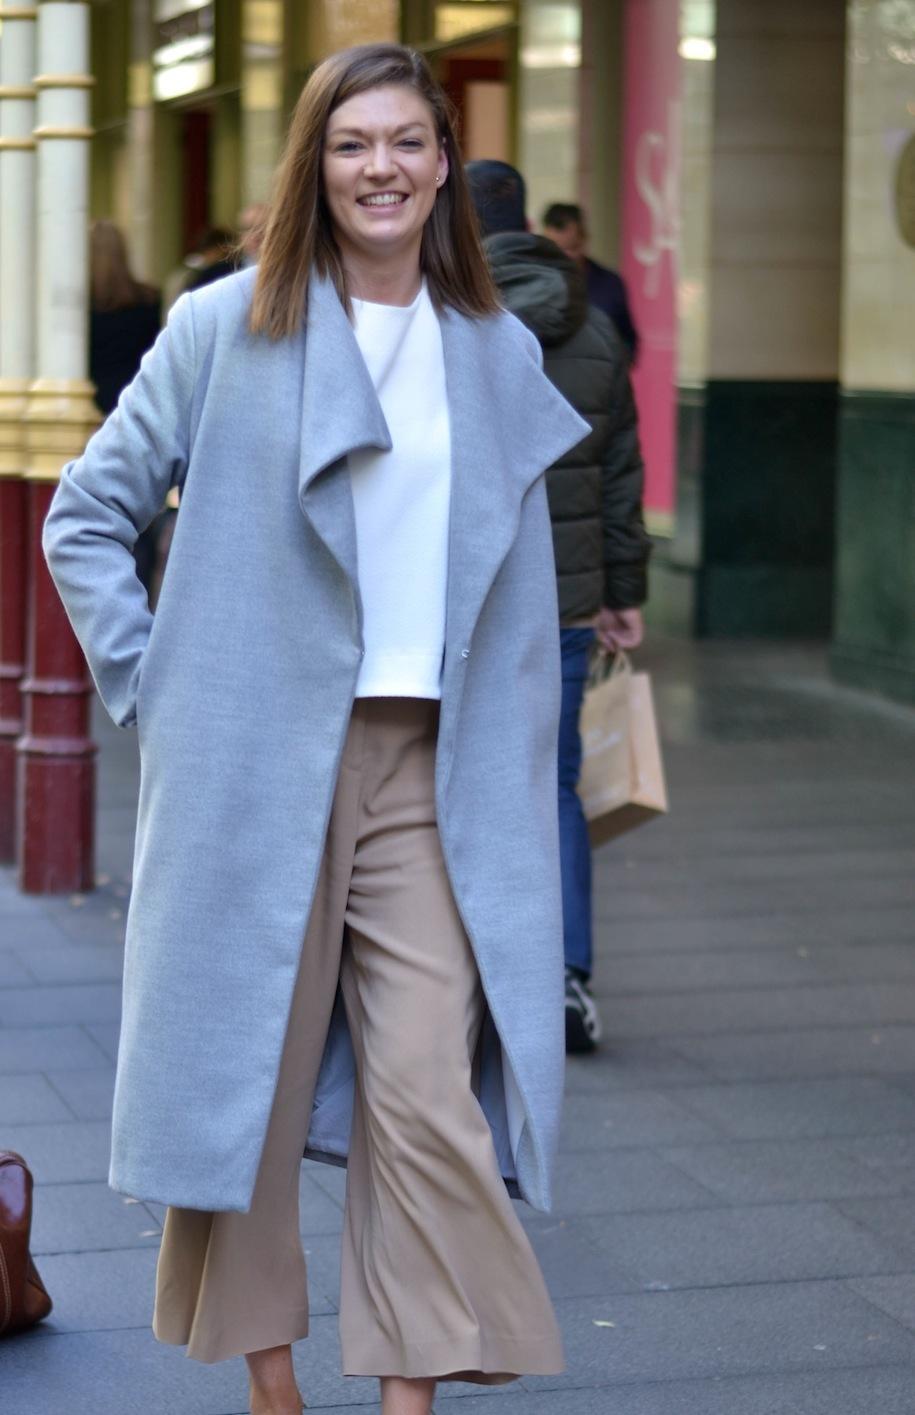 NSW: Sarah Fox, account analyst, Pitt St. Photo: Alice Scriberras.